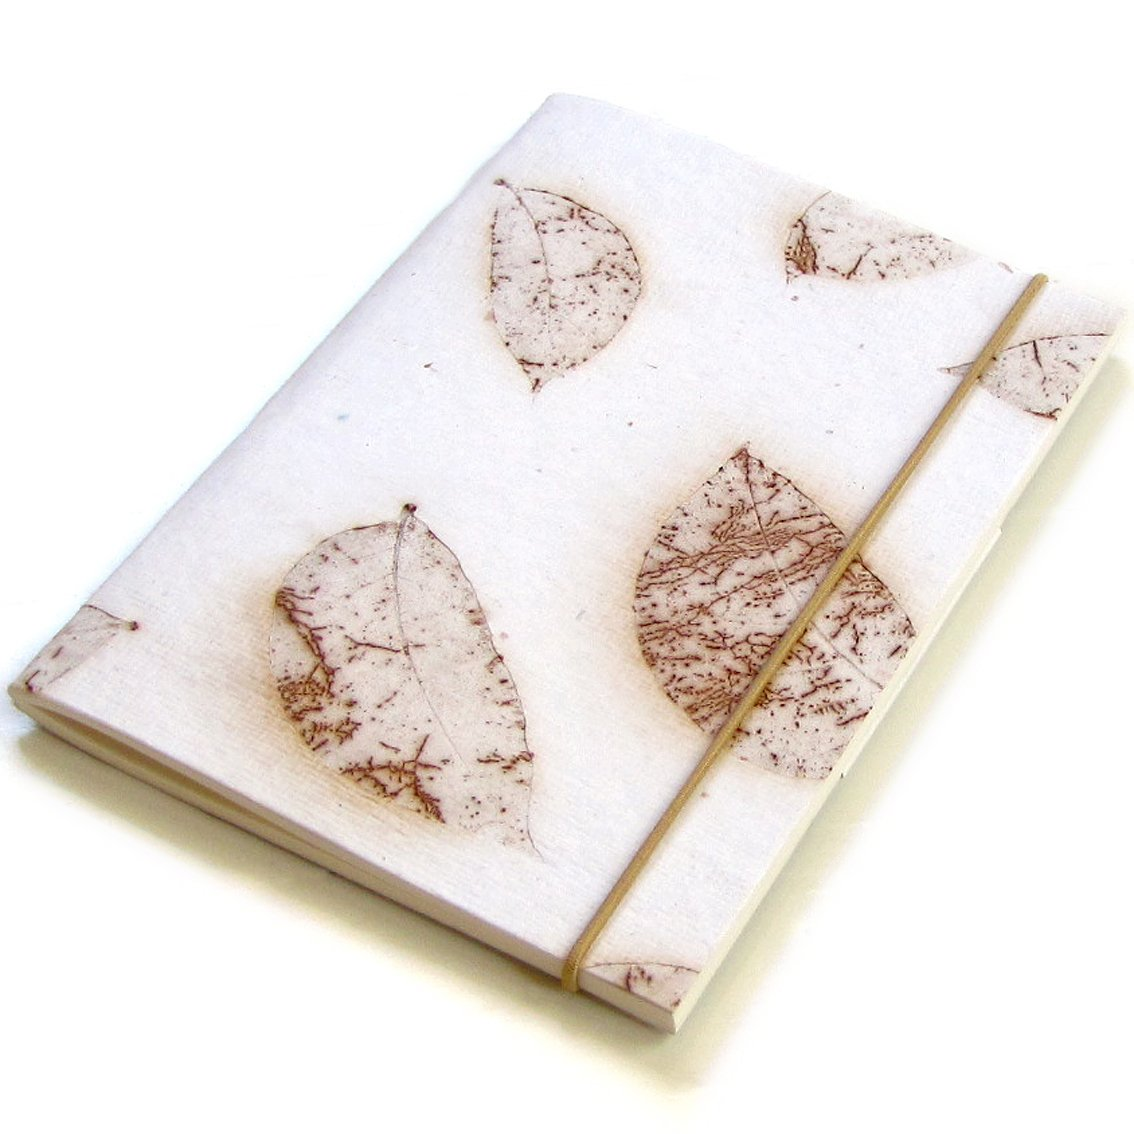 Guest book blank notebook handmade white leaf paper 5x7 40pp handmade natural leaf paper